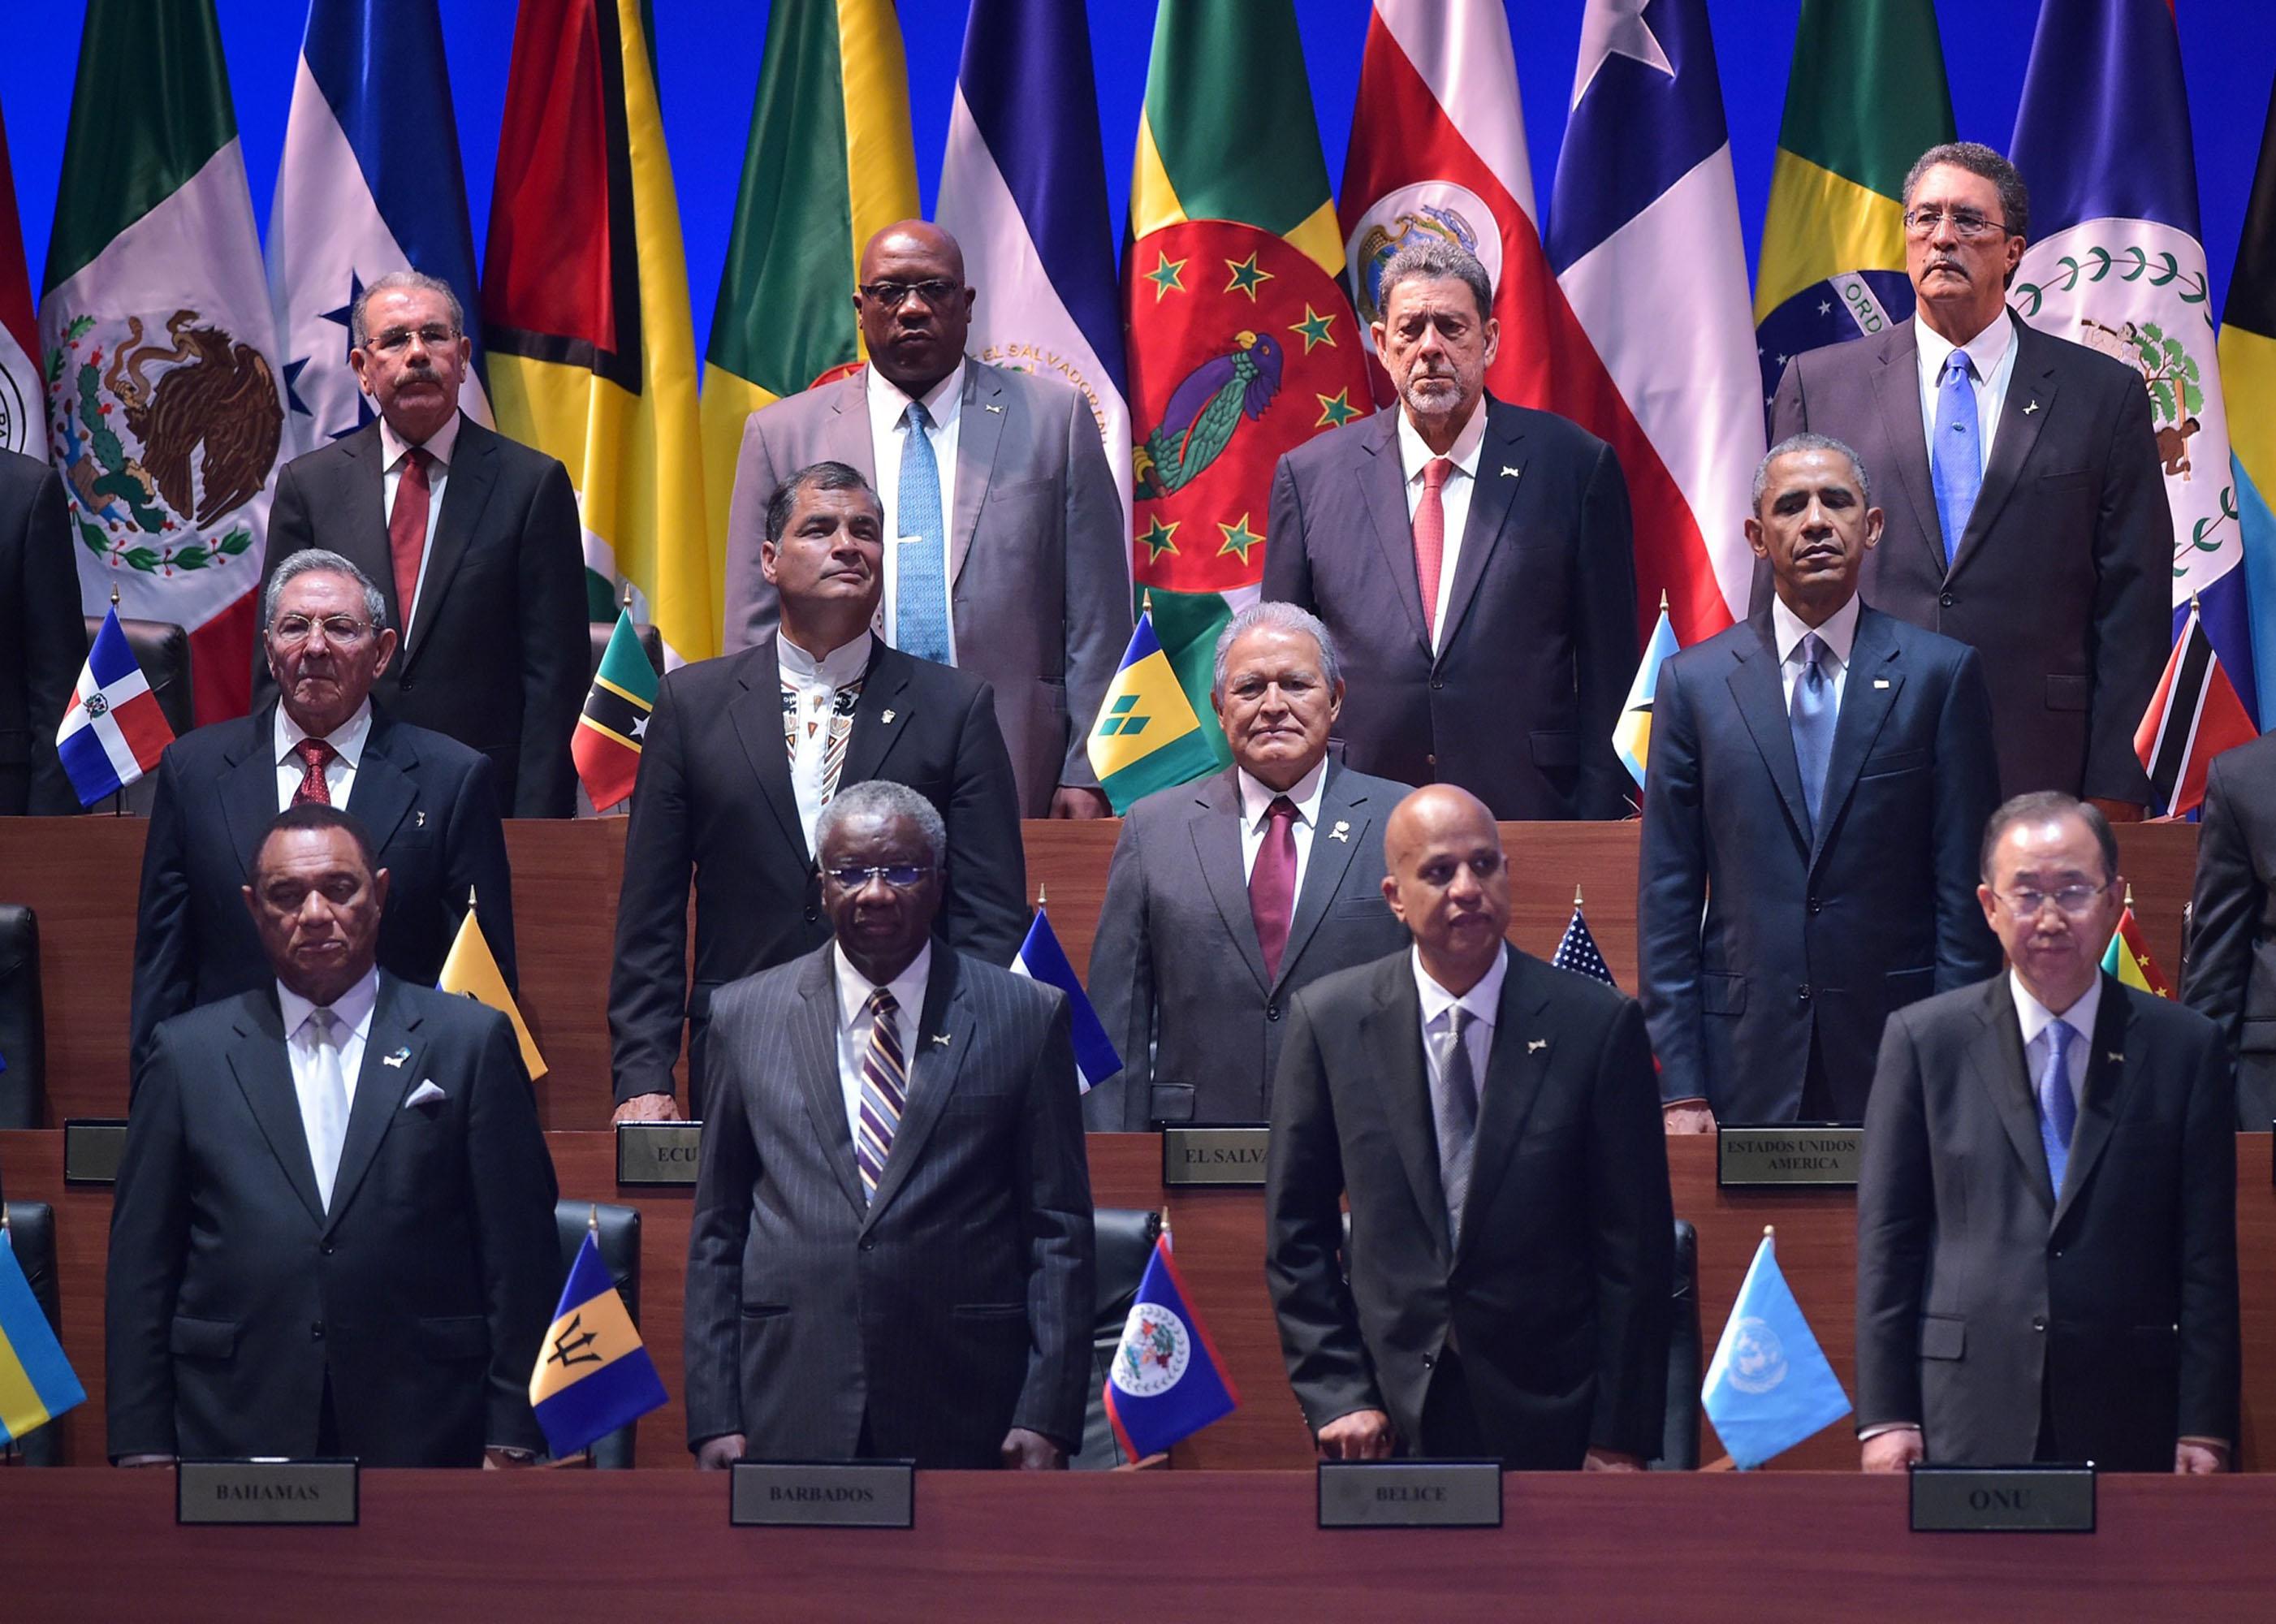 Photo of Argentina president says West seeking to destabilize Latin America